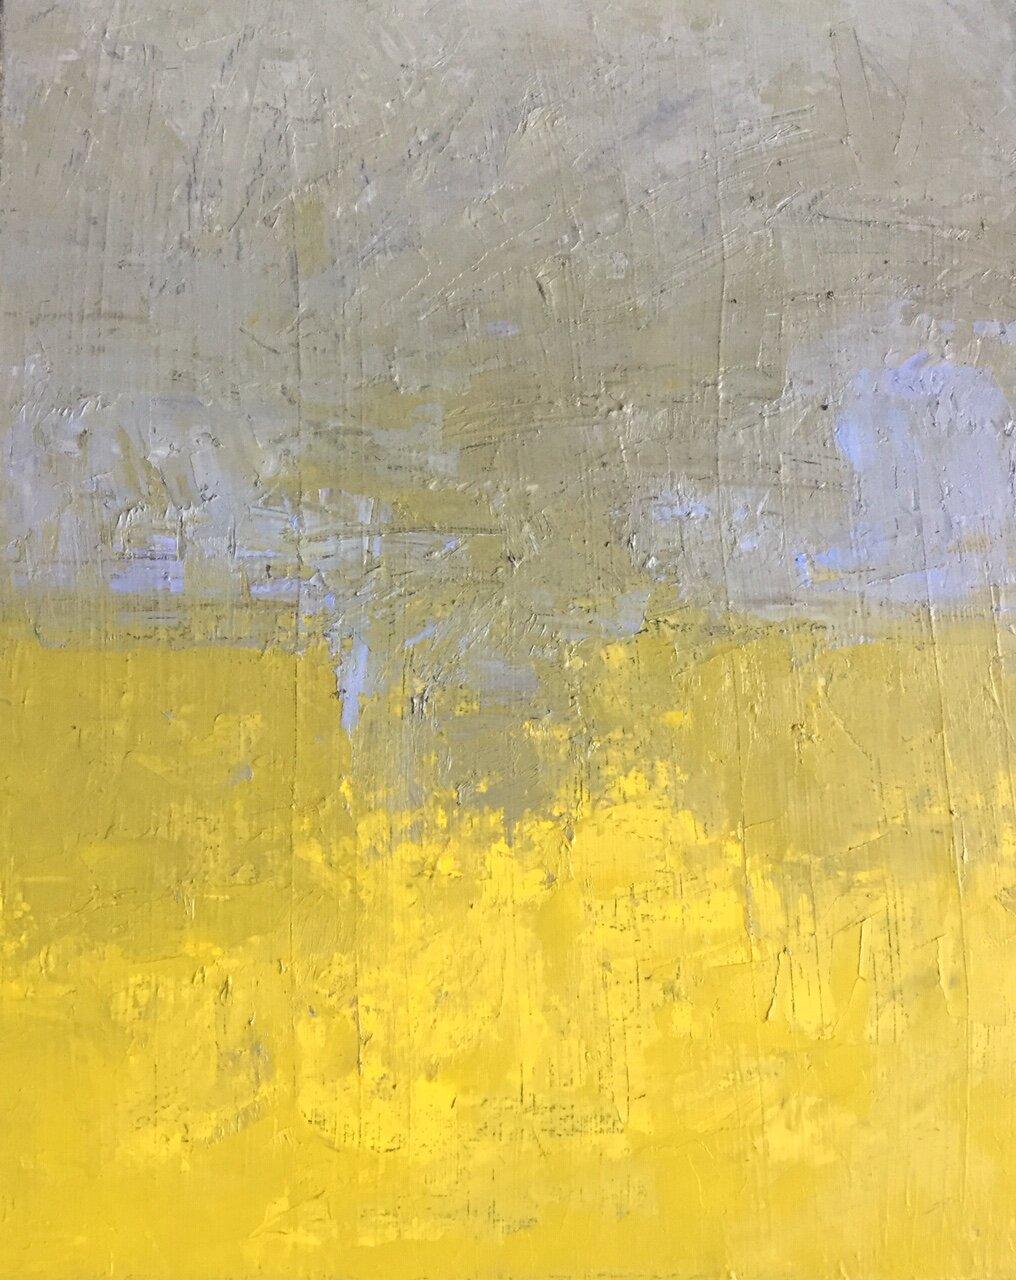 Passage (yellow, light-blue)